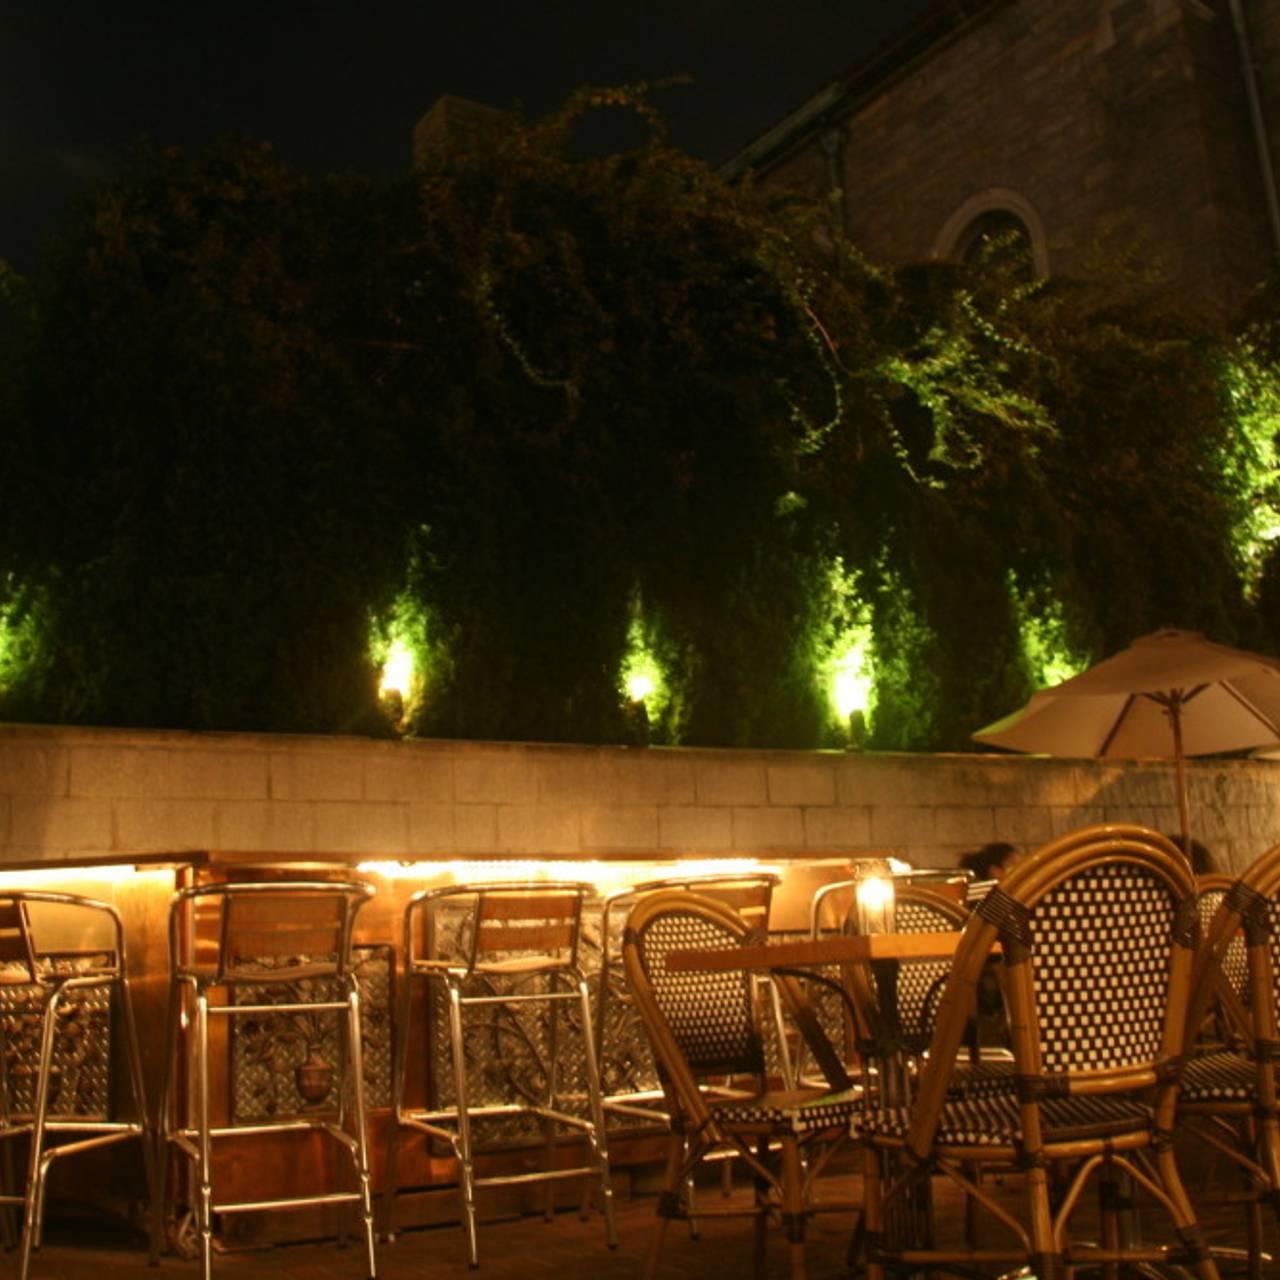 Garden Cafe Restaurant - New York, NY | OpenTable